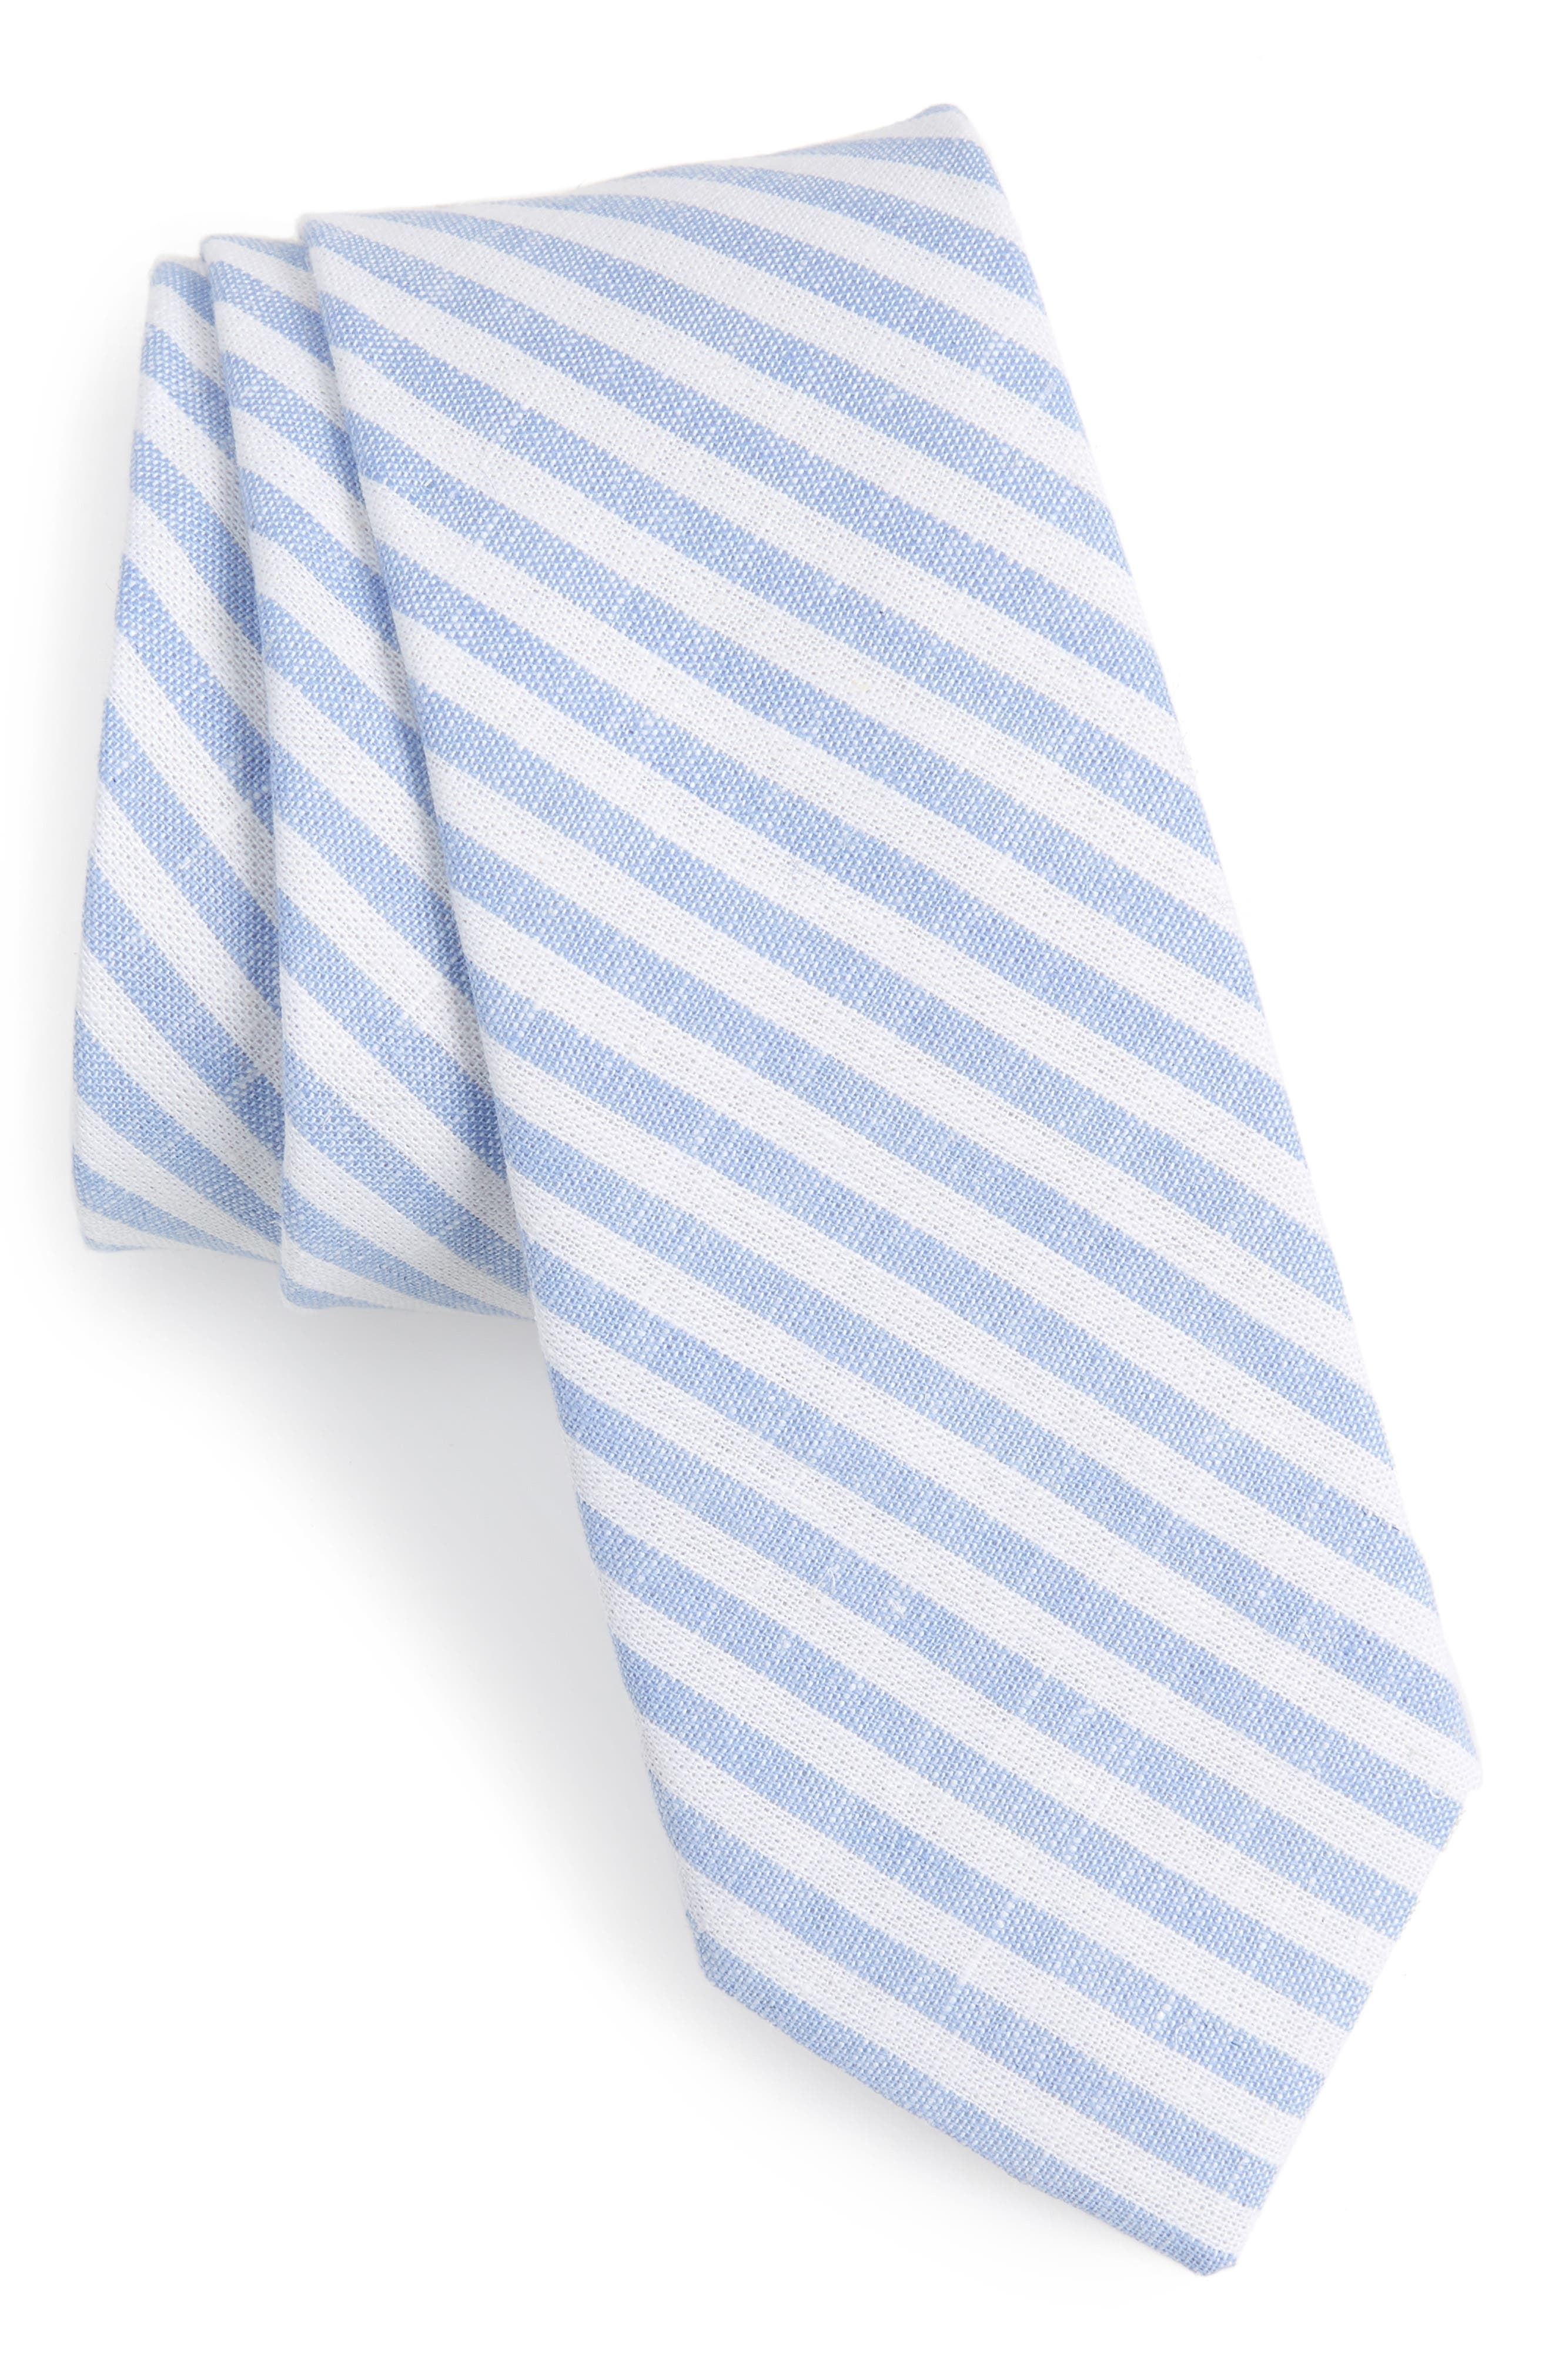 Telary Stripe Cotton Skinny Tie,                             Main thumbnail 1, color,